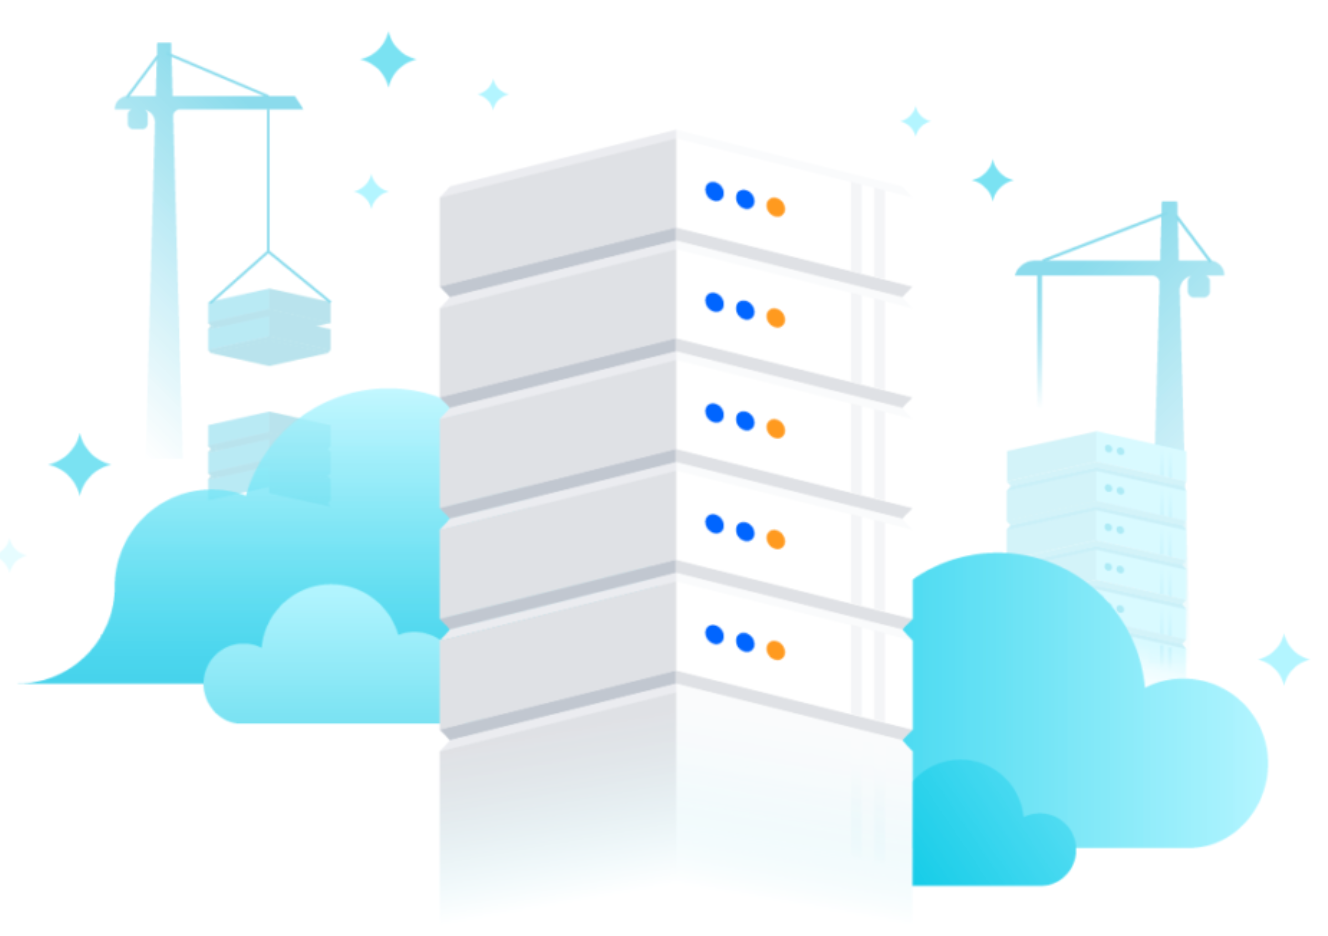 Atlassian Data Center IaaS